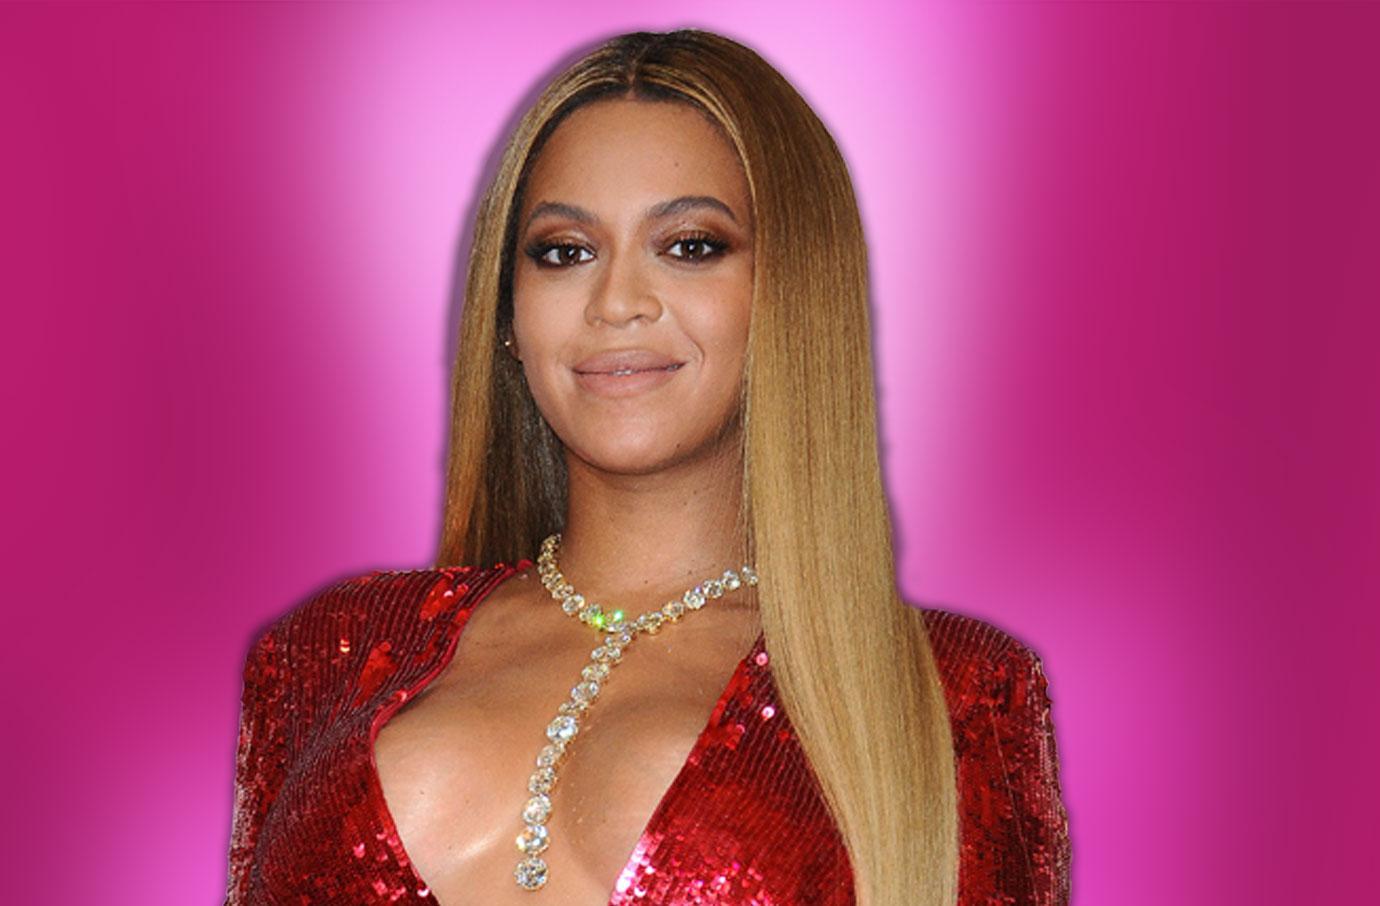 Beyonce Twins Home Maternity Ward